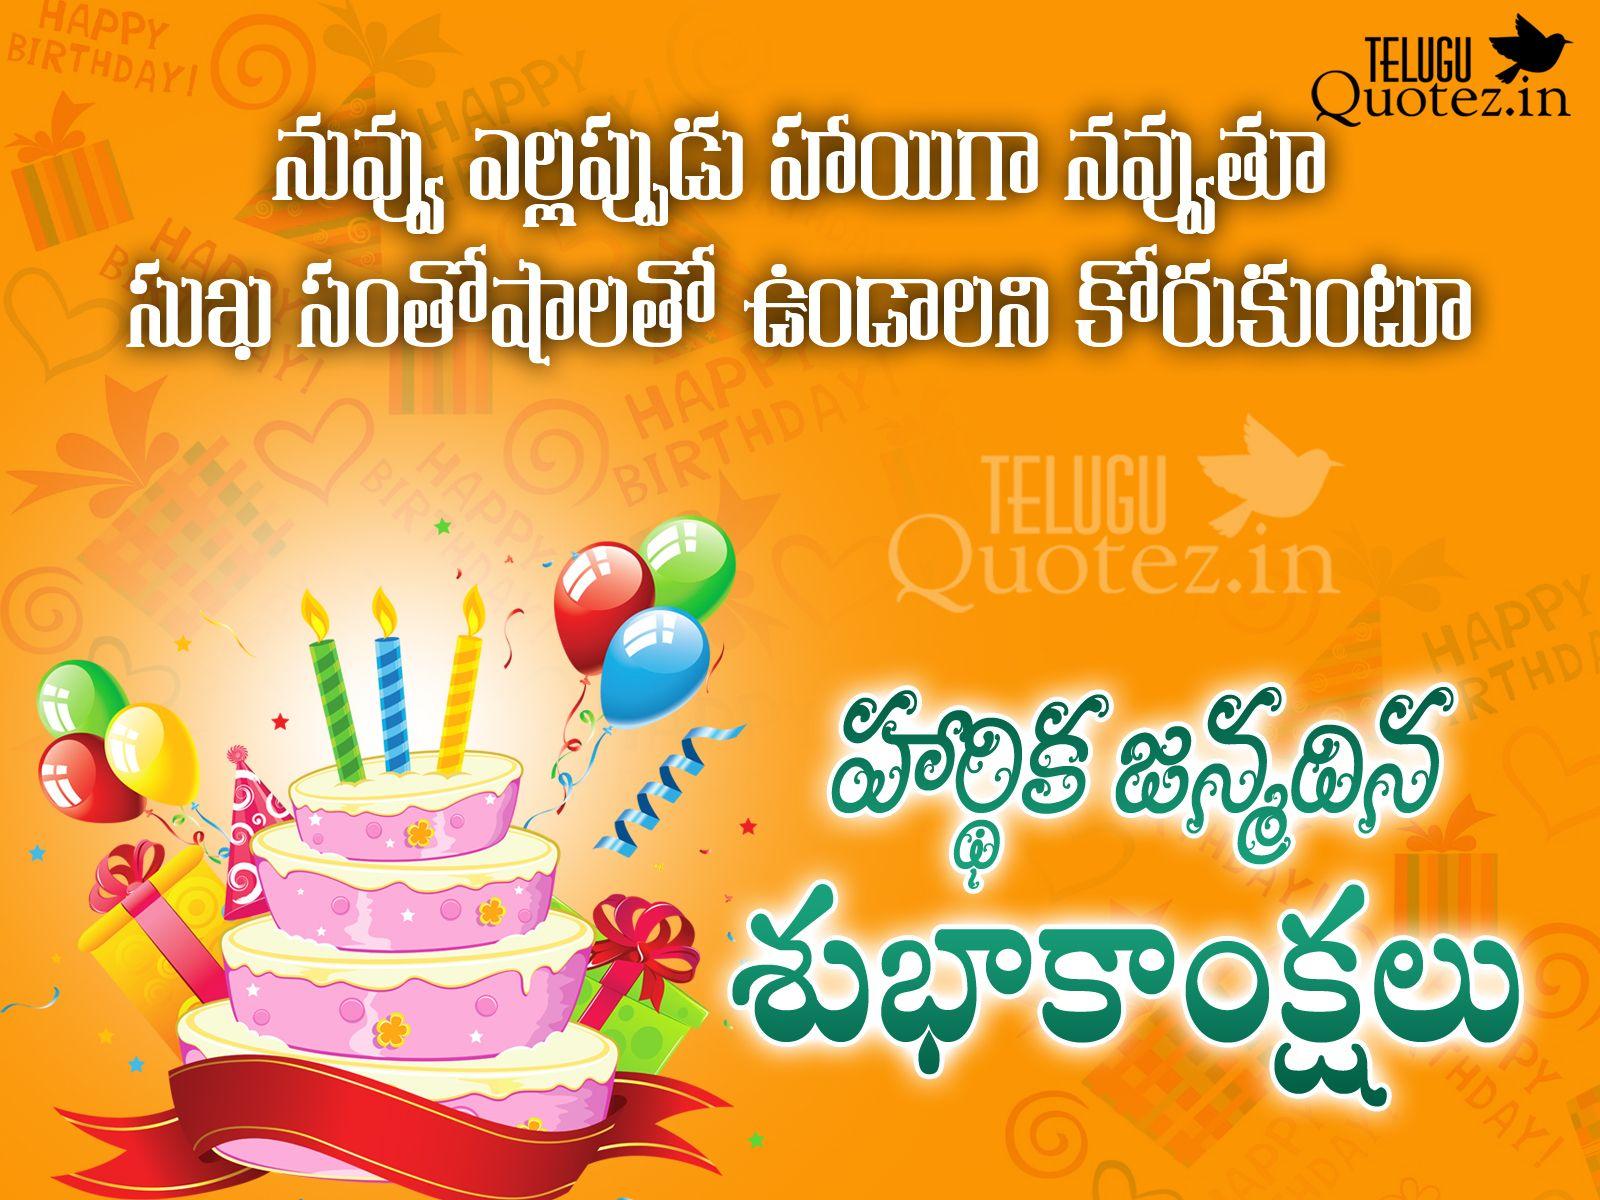 Happy Birthday Wishes Greeting In Telugu Language How To Wish Happy Birthday In Telugu